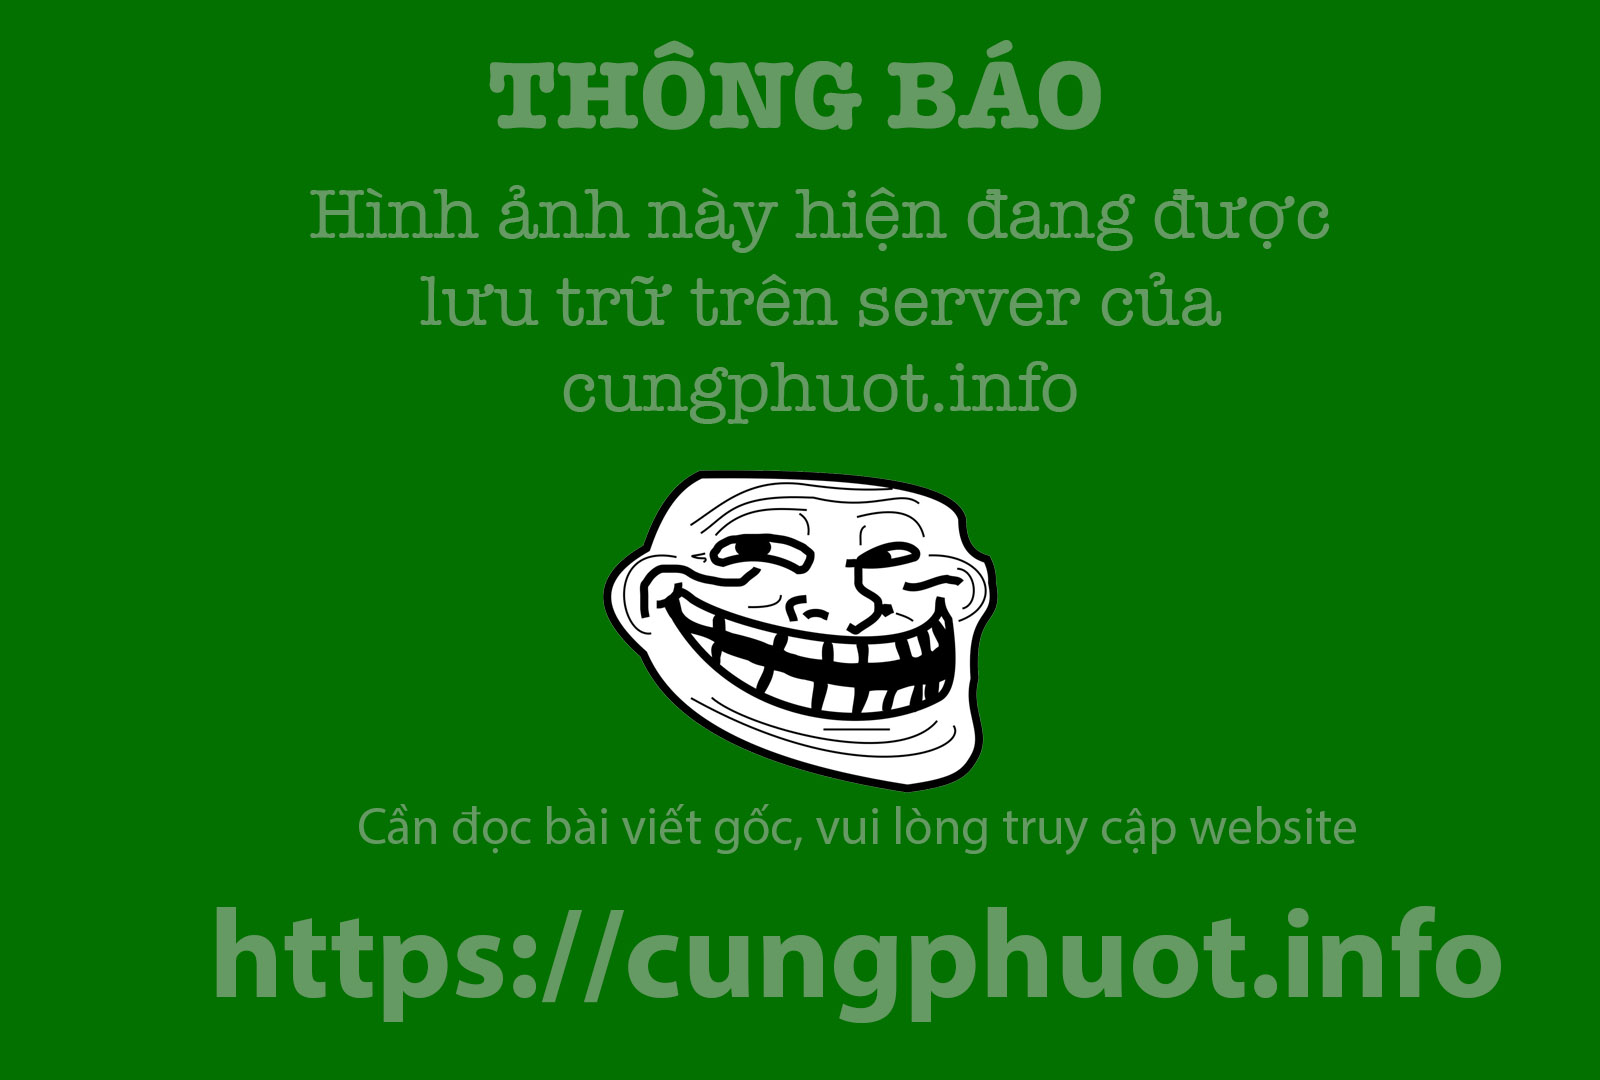 Binh minh tuyet dep tren nhung doi che Tan Cuong hinh anh 10